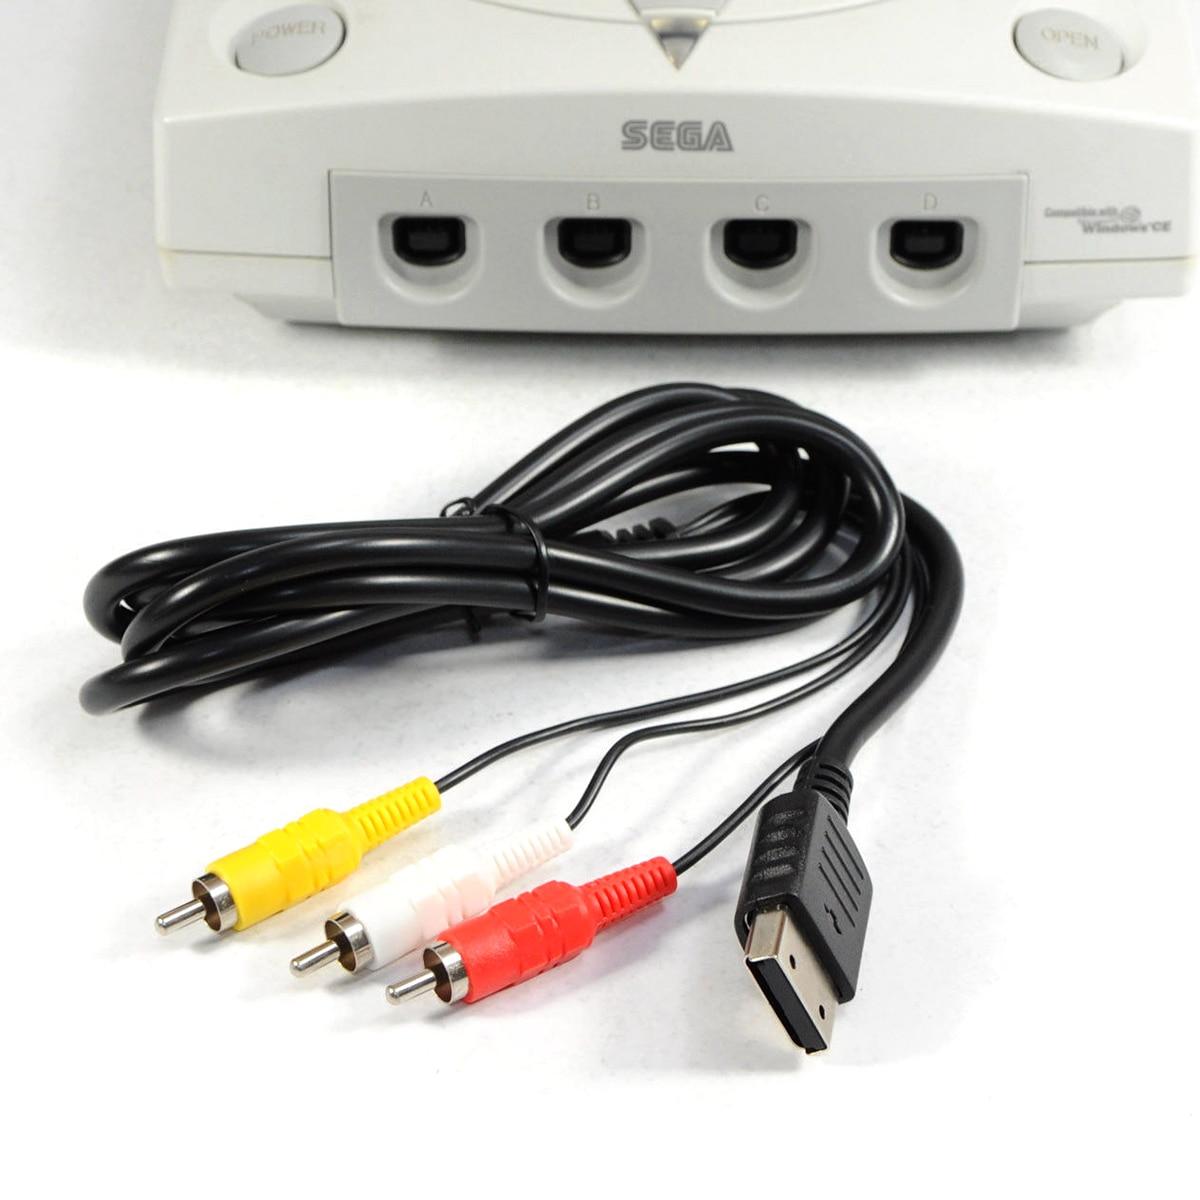 6FT RCA AV A V Audio Video Cable for Sega Dreamcast Stereo Composite Audio Video TV